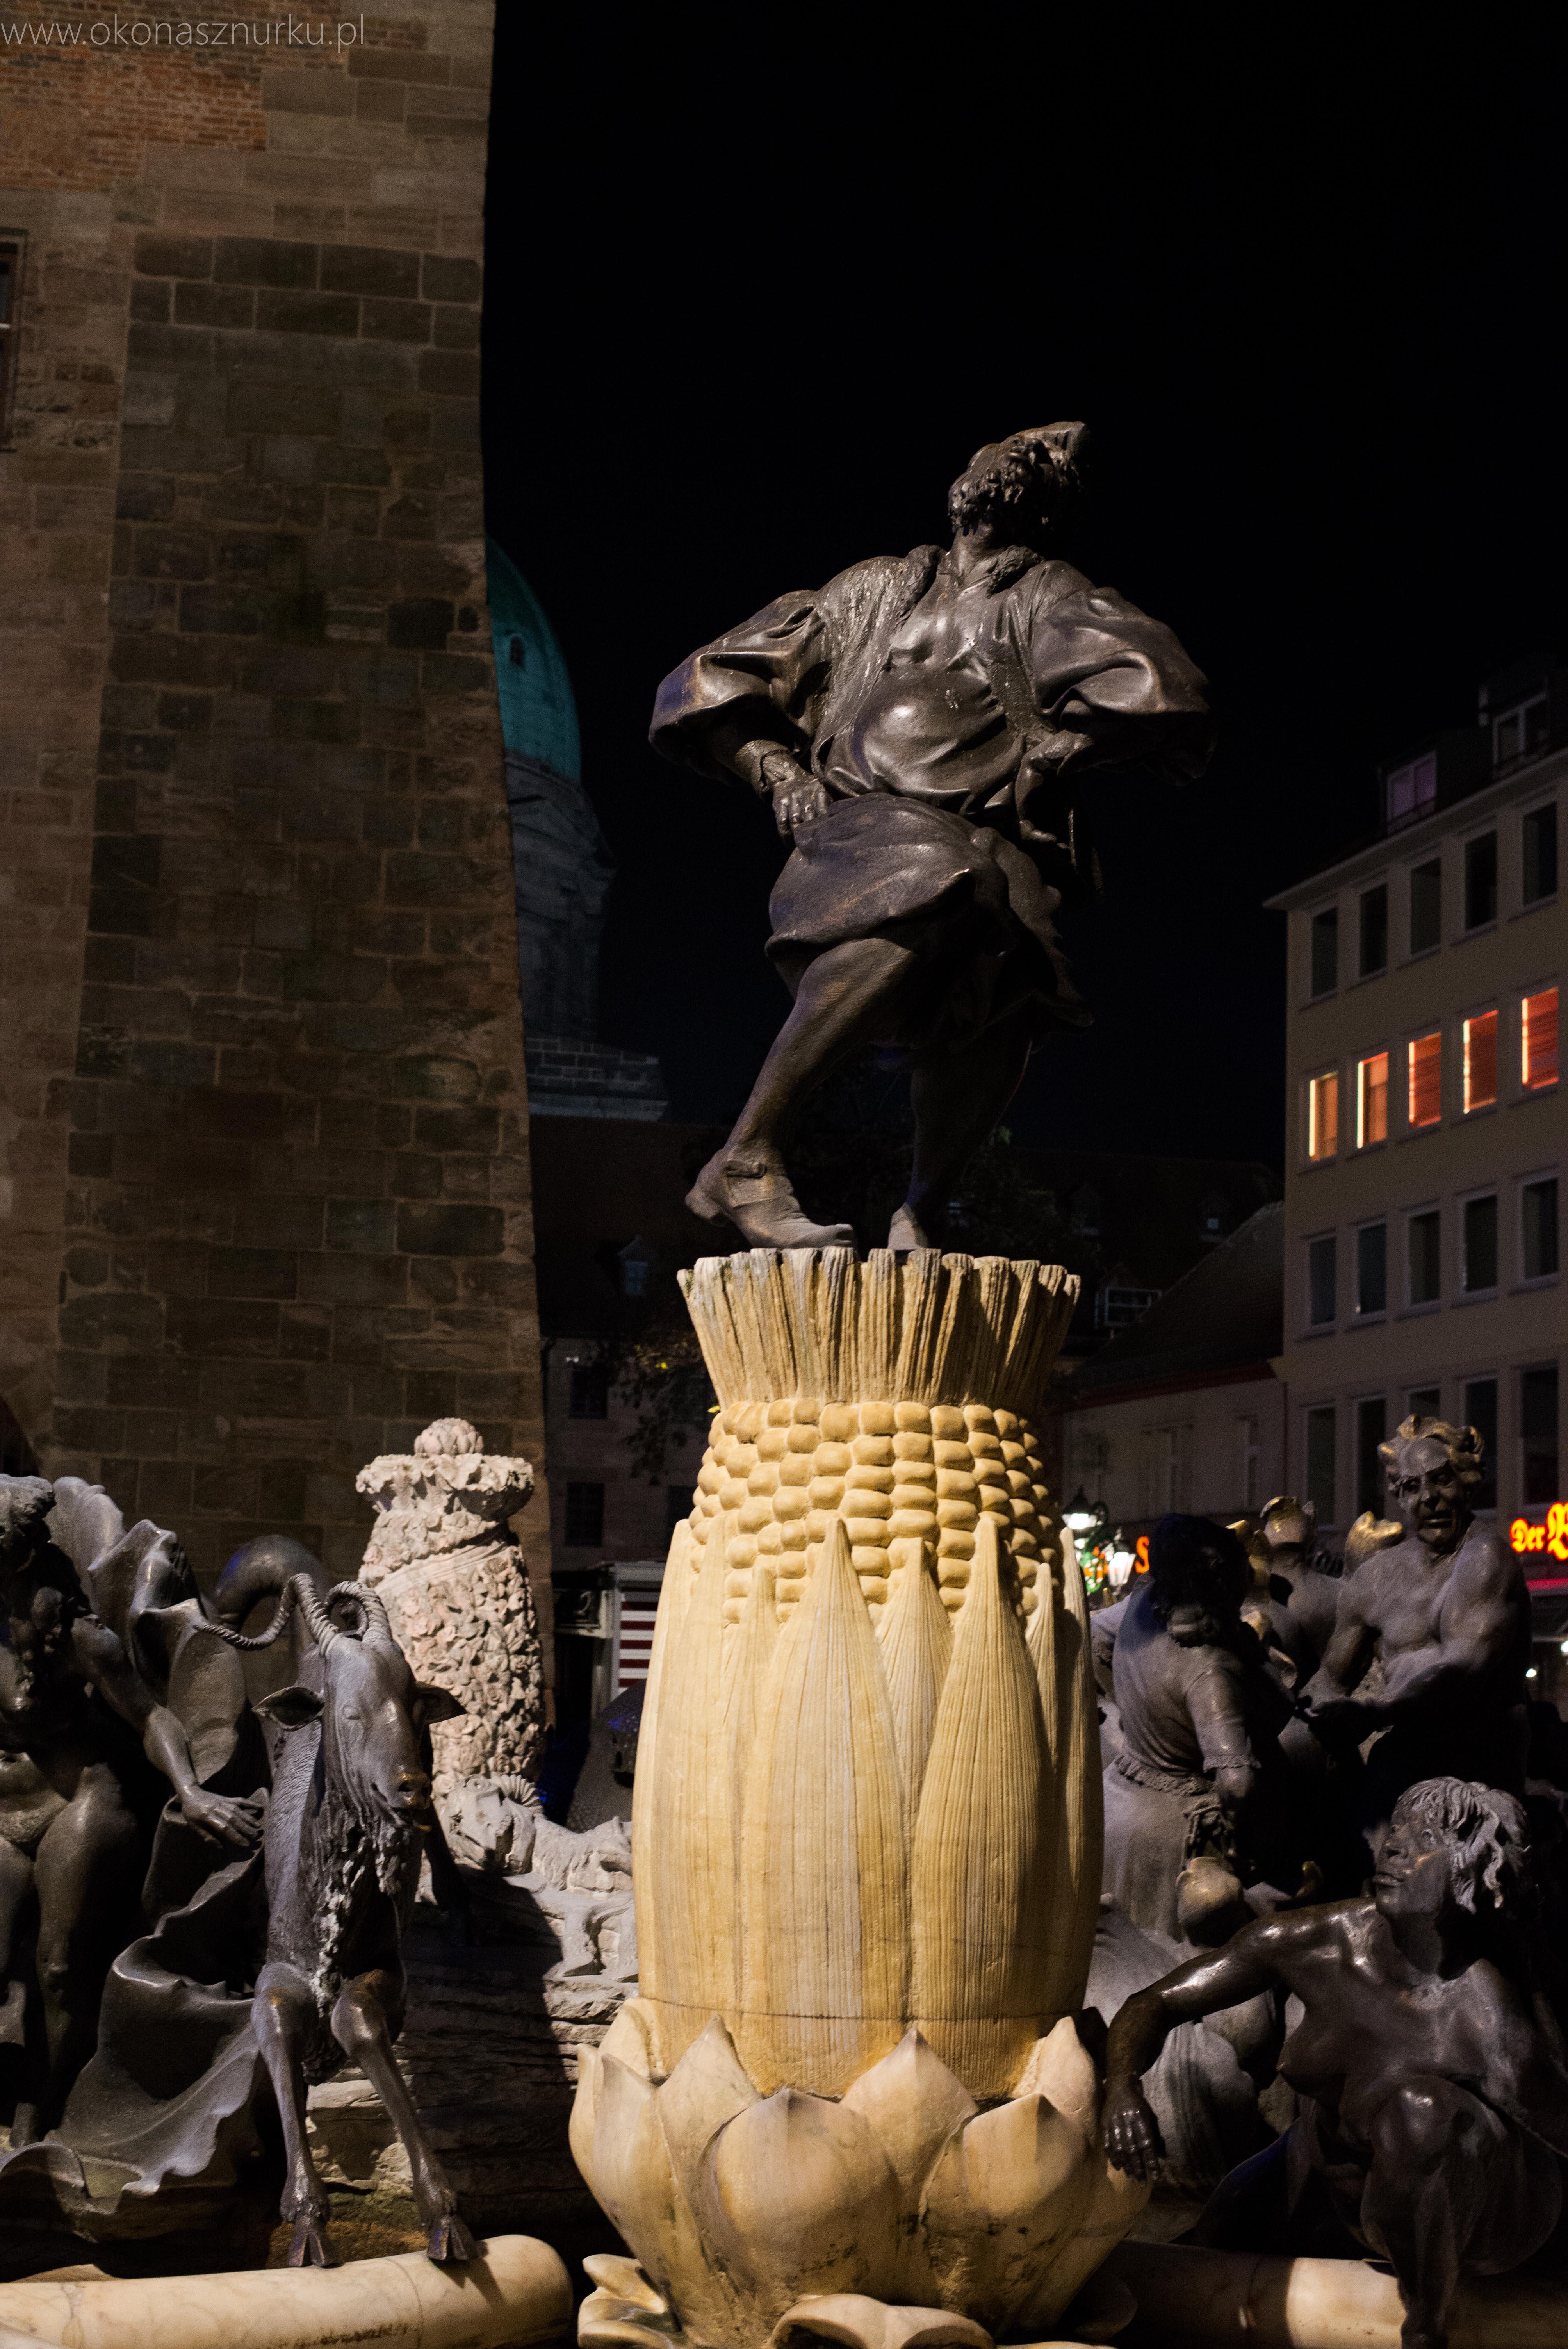 Nürnberg-stadt-norymberga-bayern-city-frankonia (40)